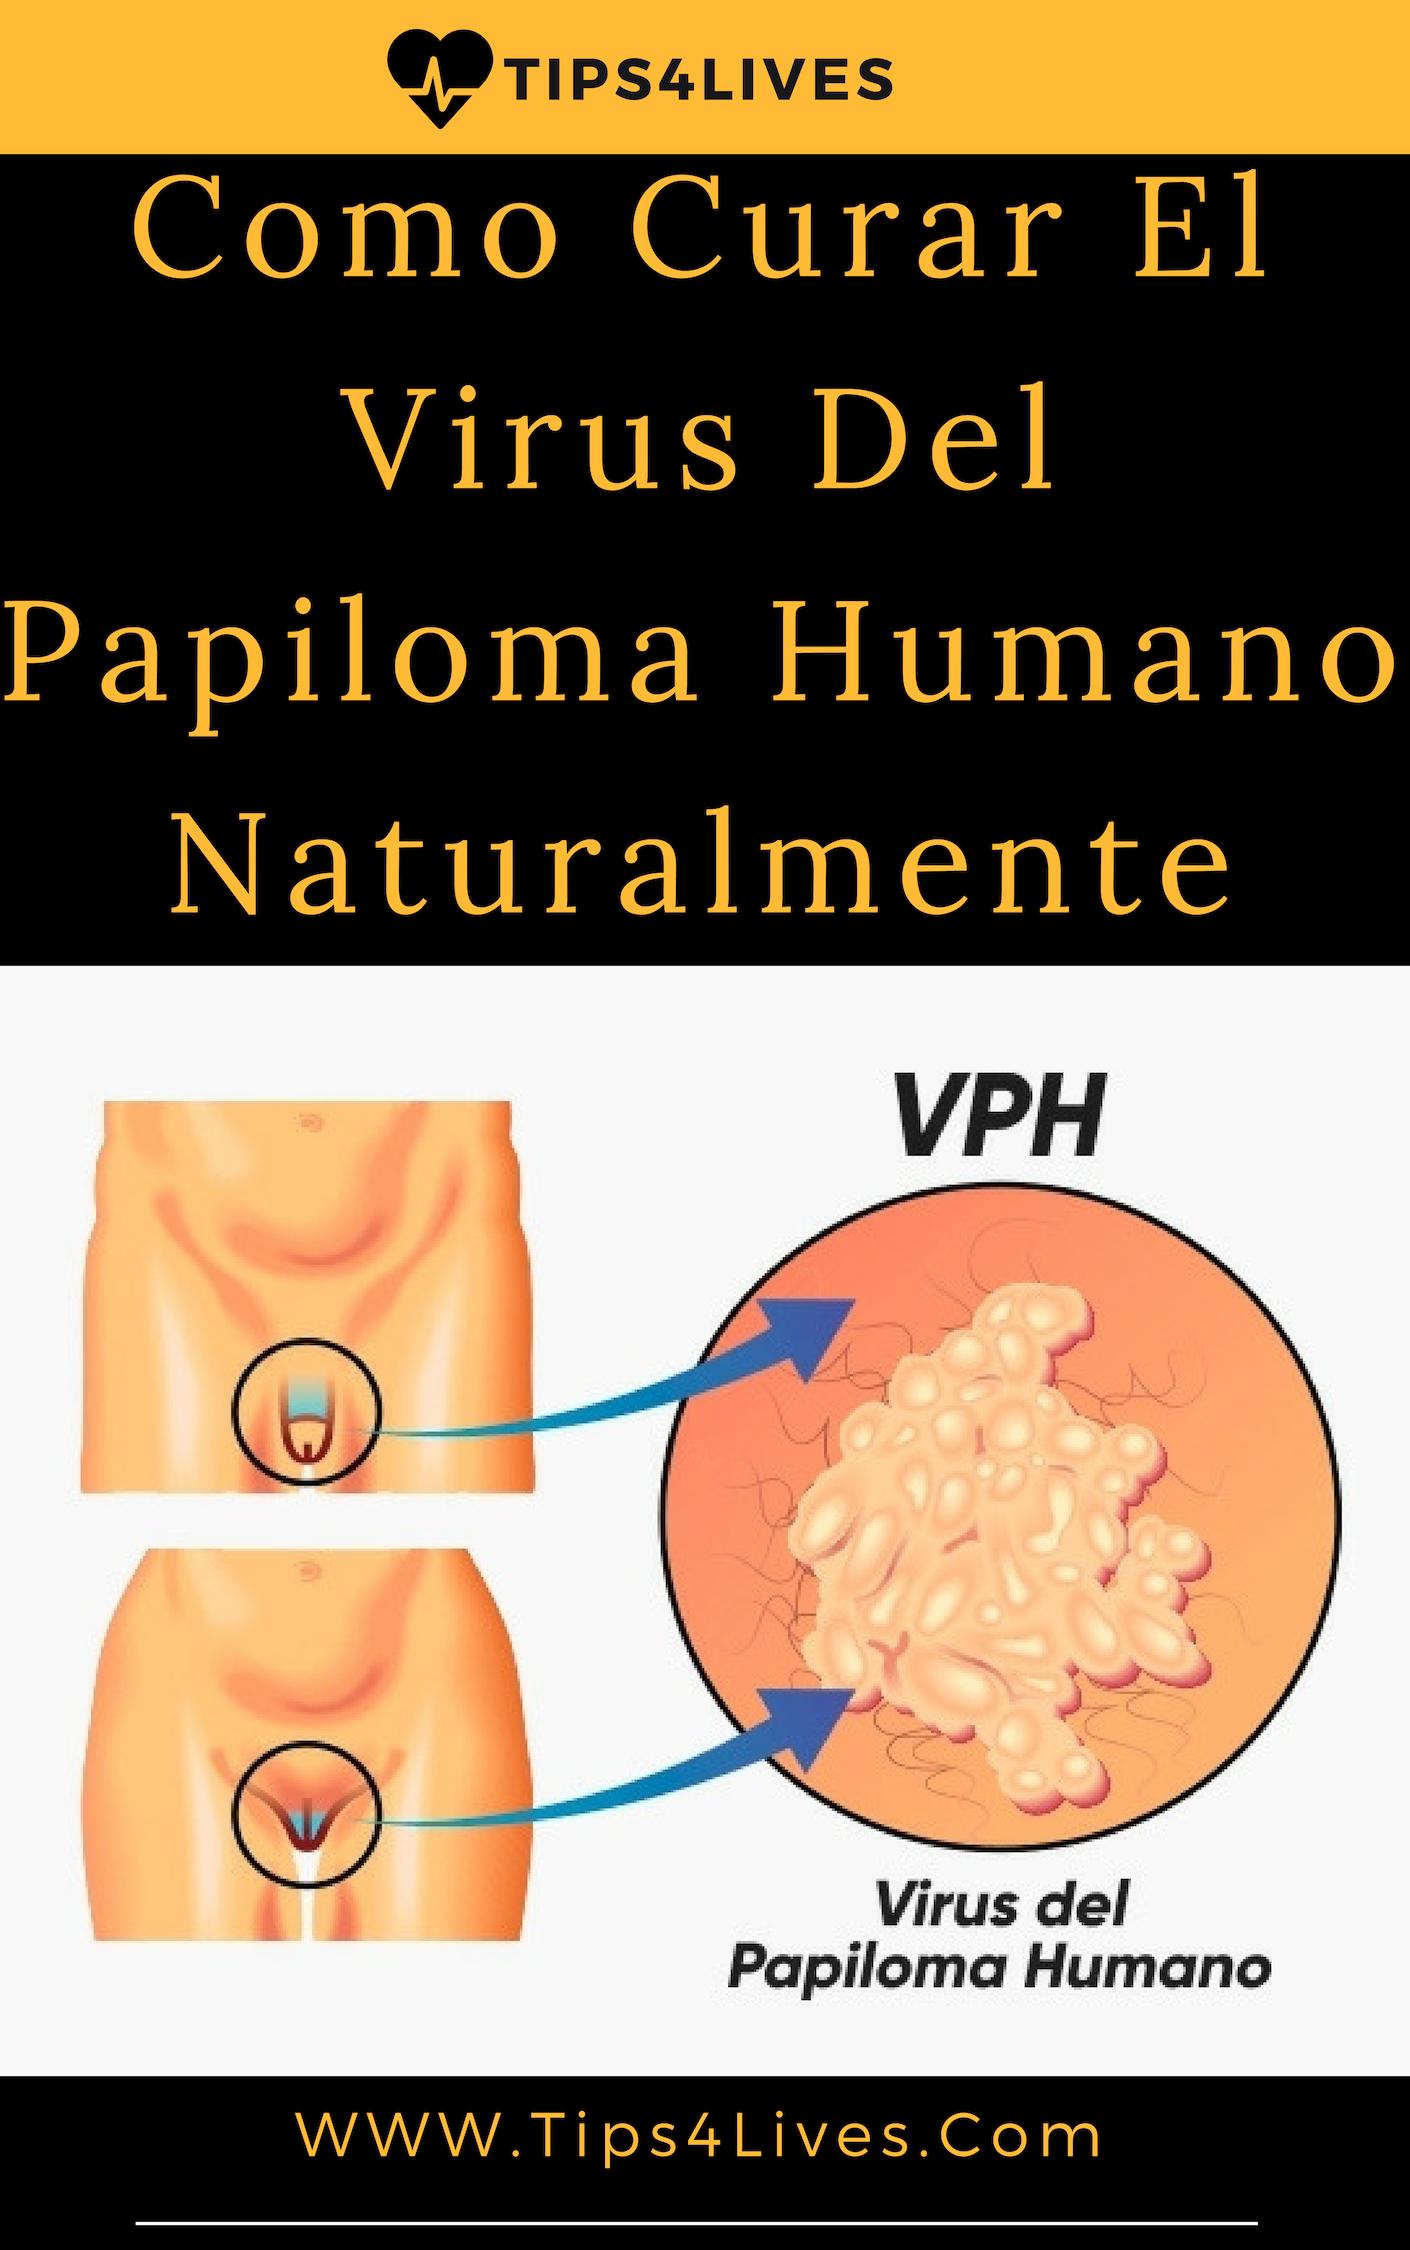 virus del papiloma humano se cura hpv impfung jungen grunde